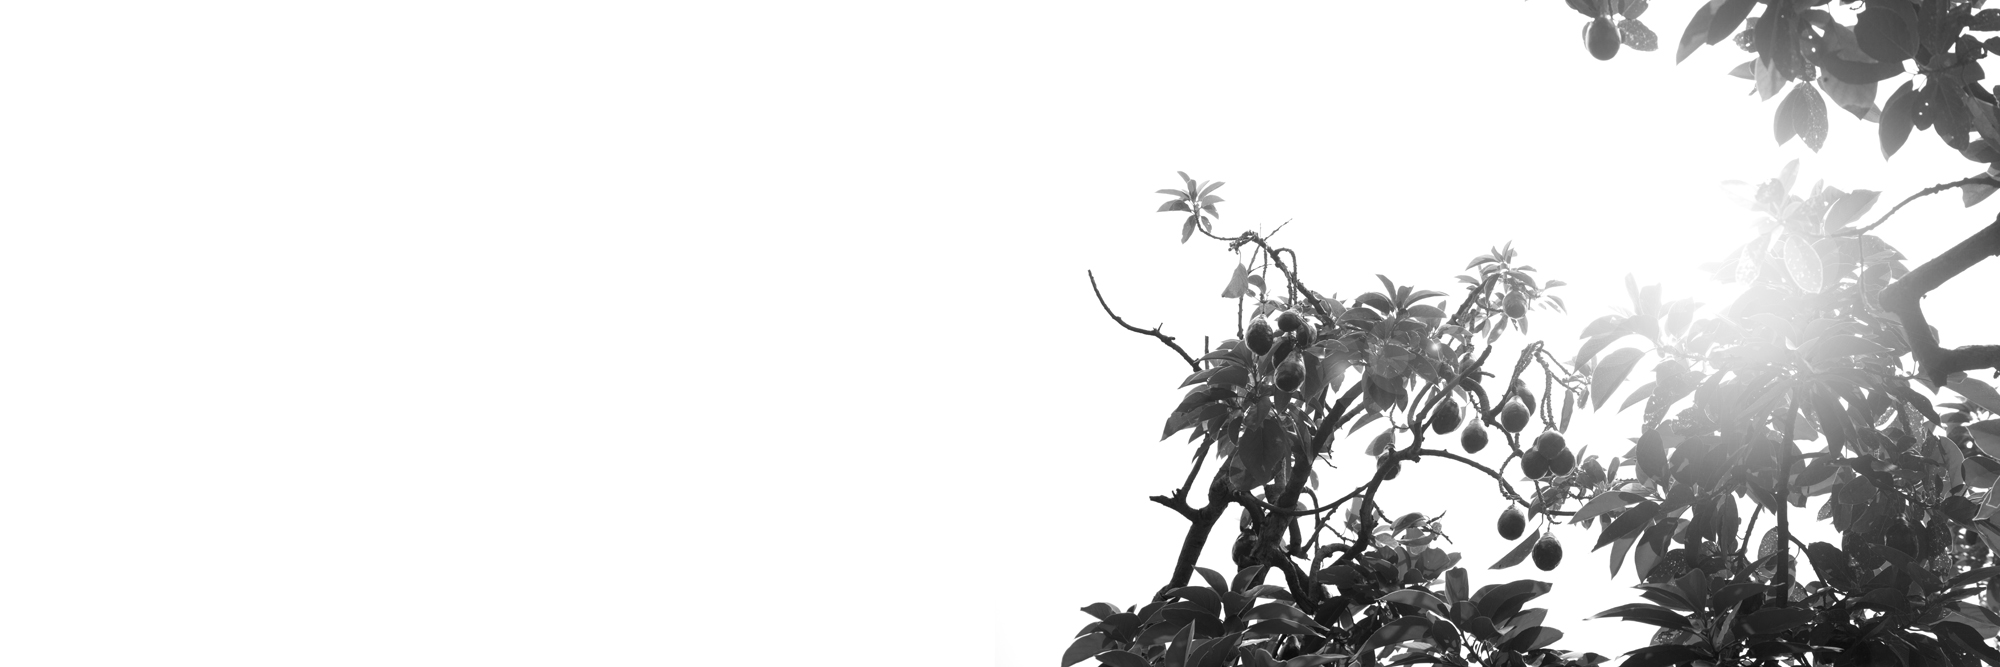 Sol_002_Aura011.jpg